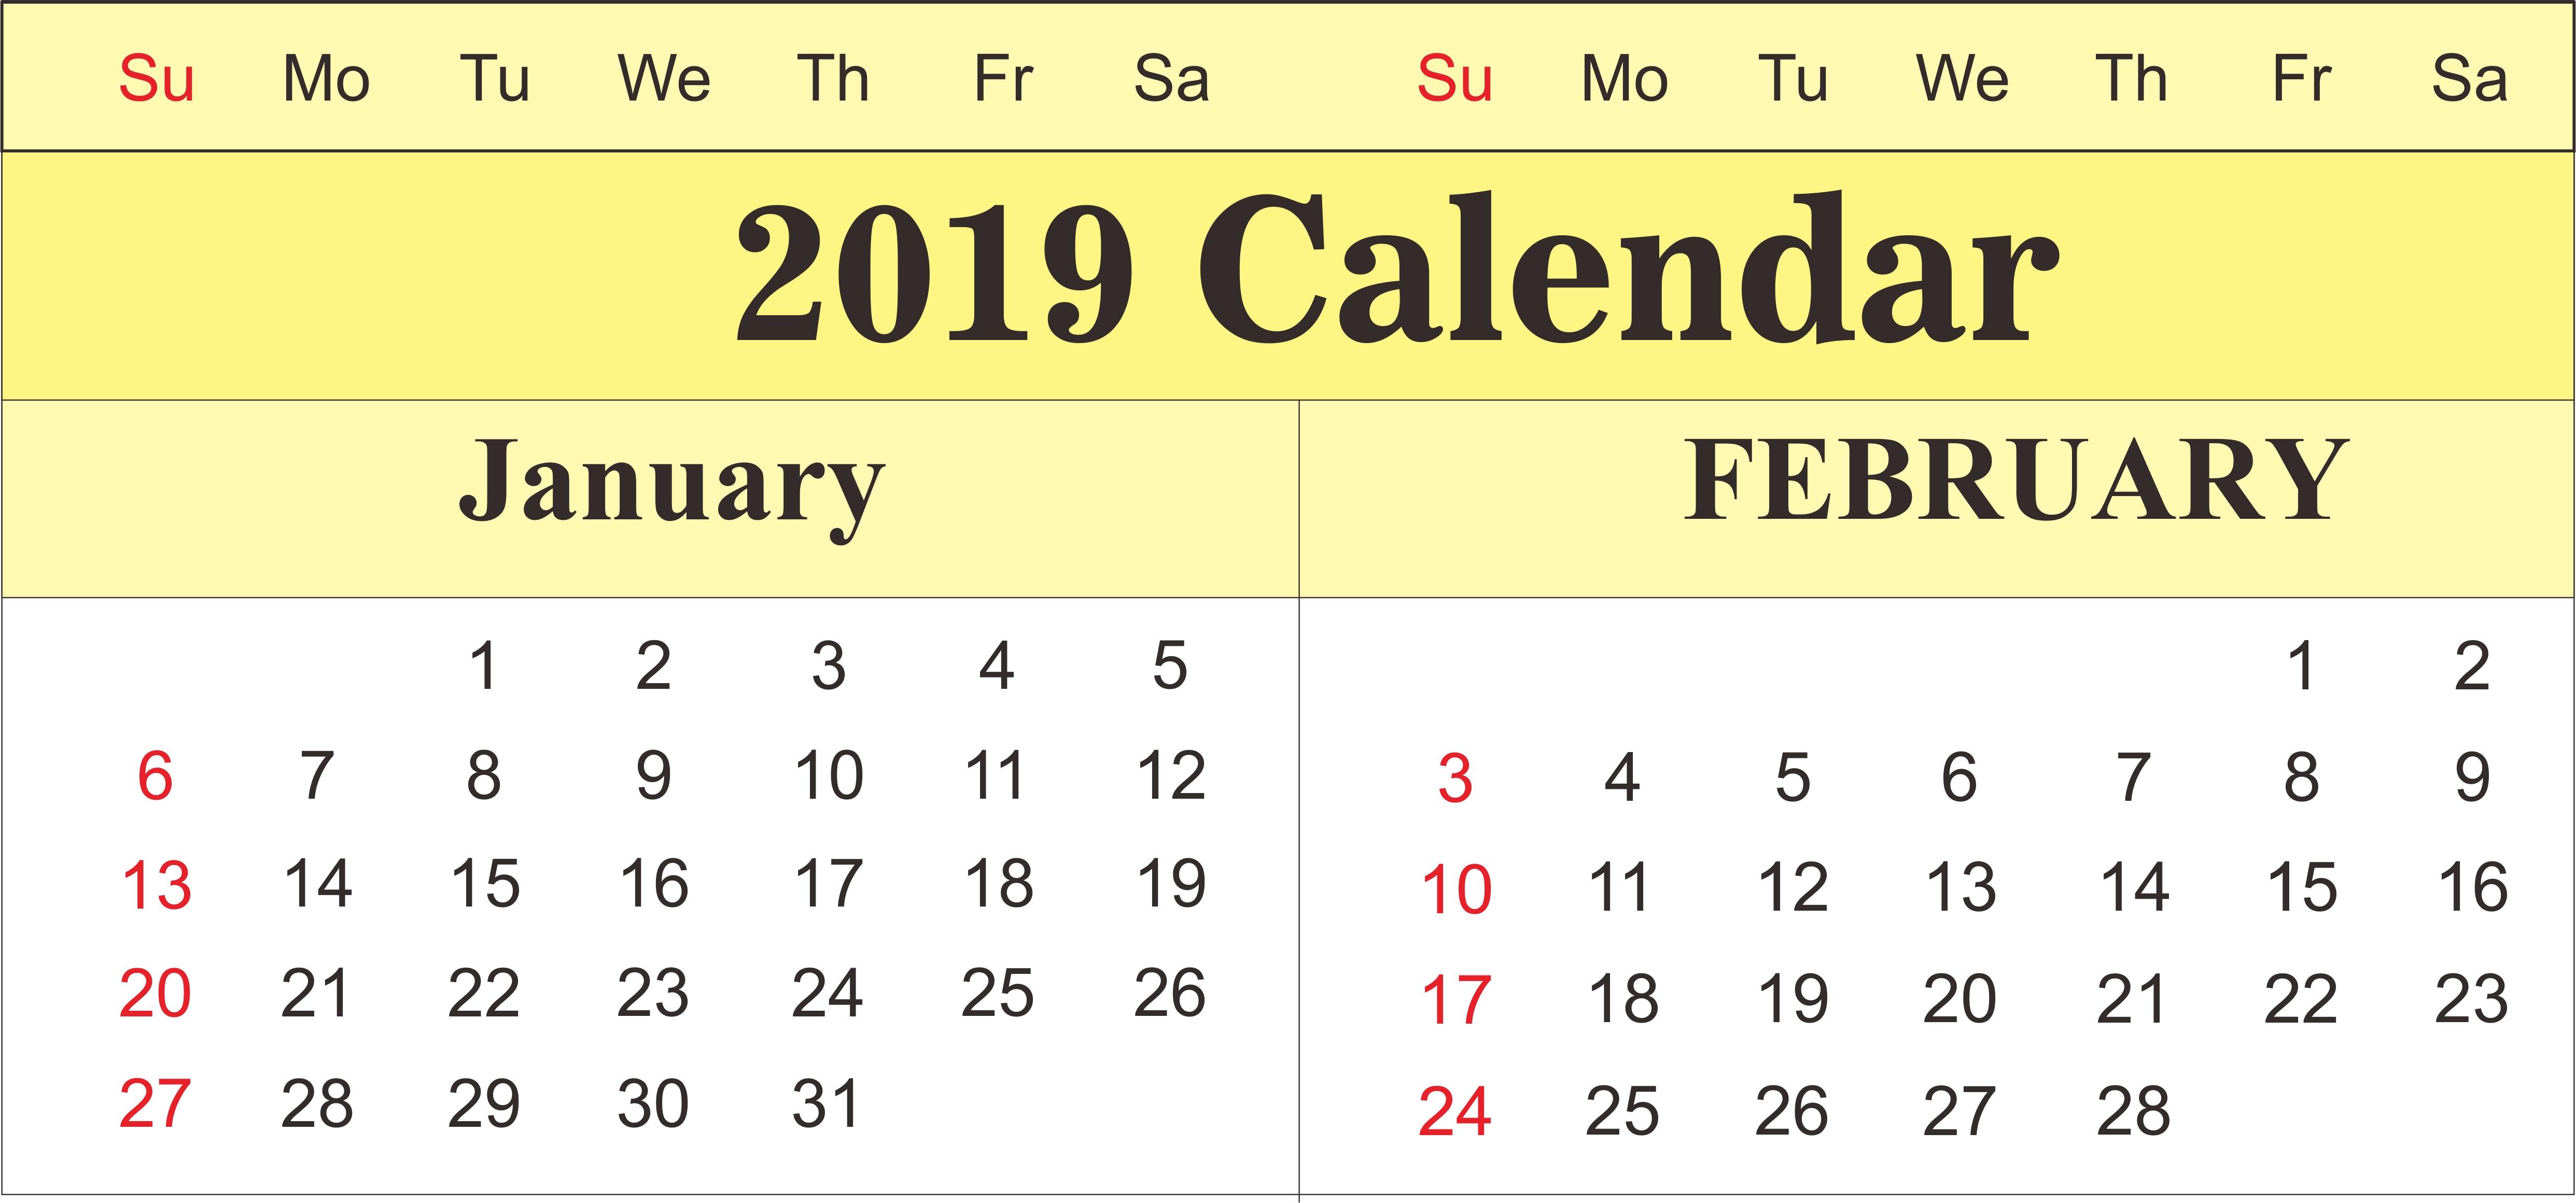 Get Free January And February 2019 Printable Calendar Templates January 9 2019 Calendar